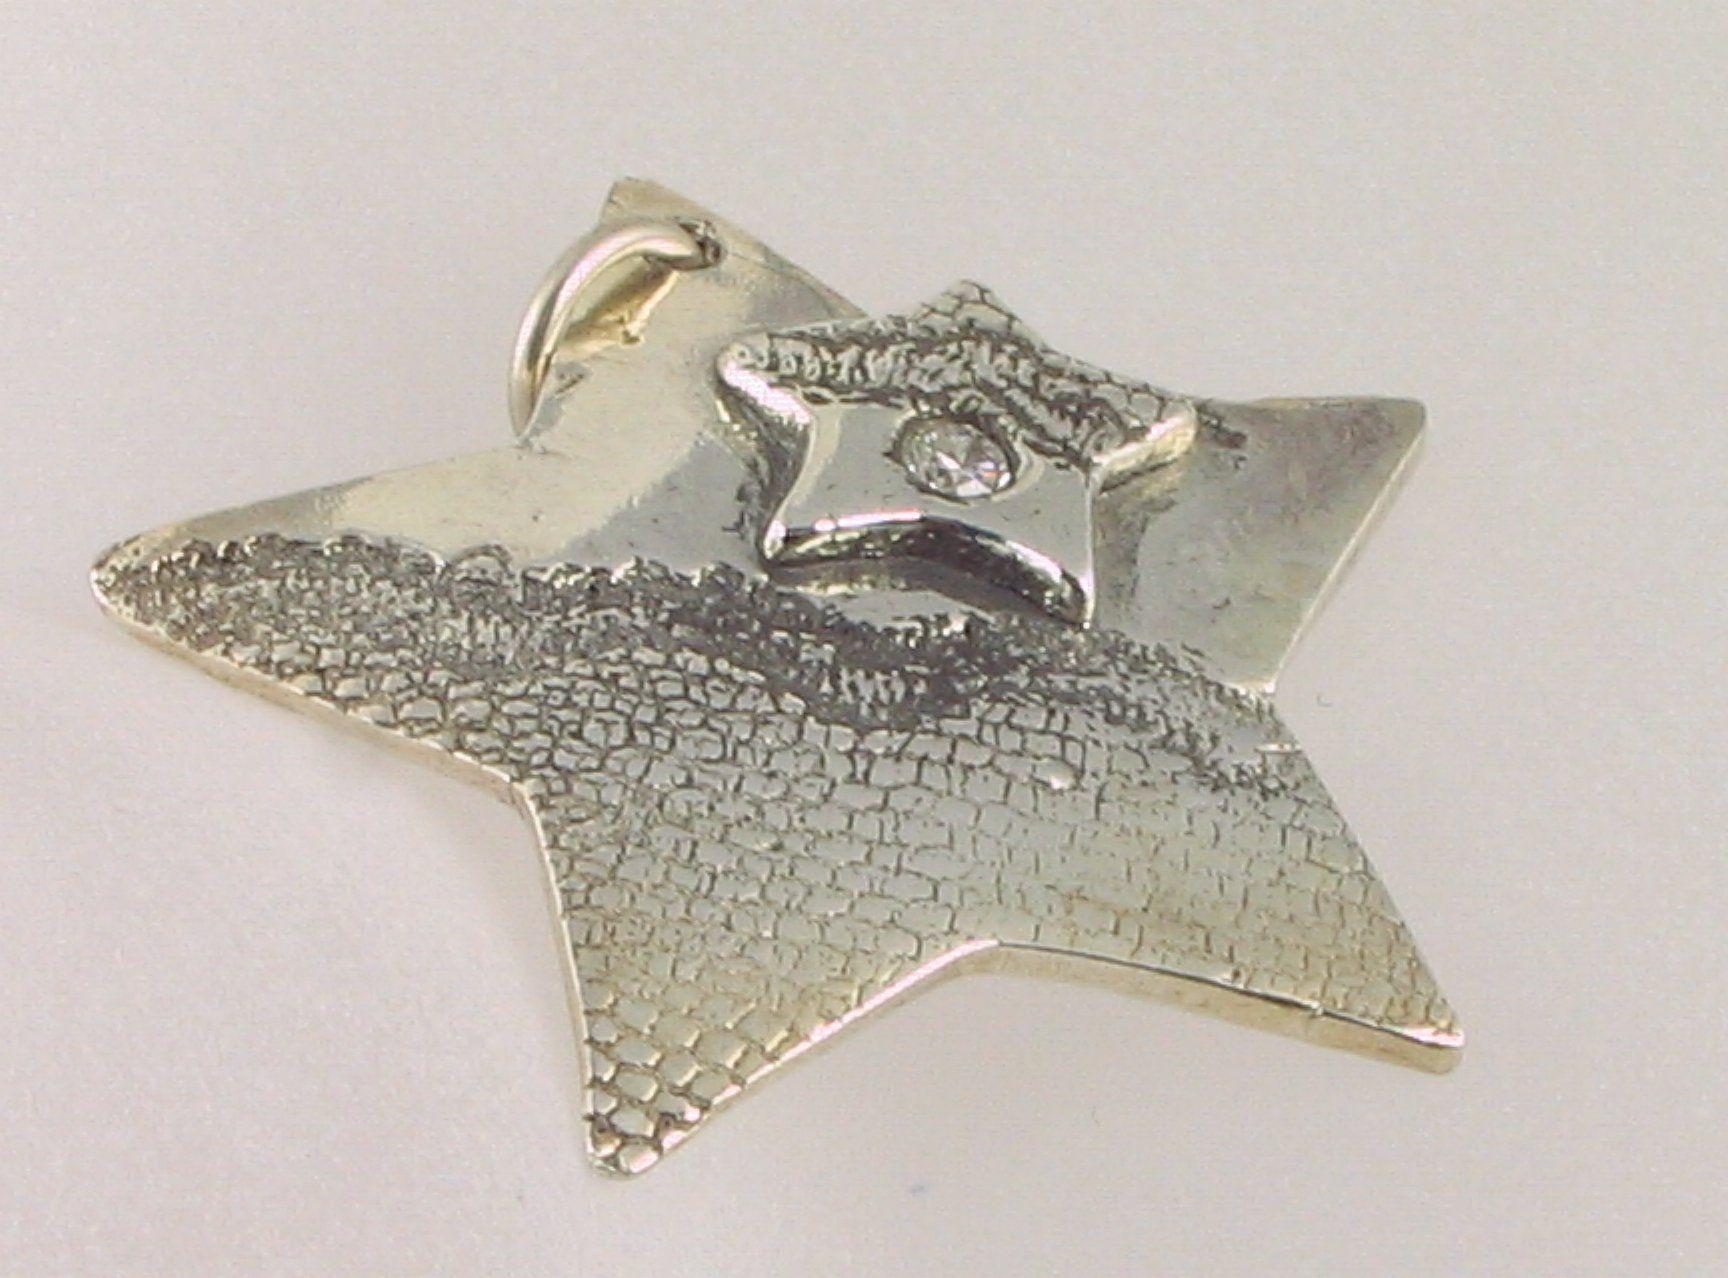 precious metal clay tutorials | Star made of Precious Metal Clay copyright Helen White